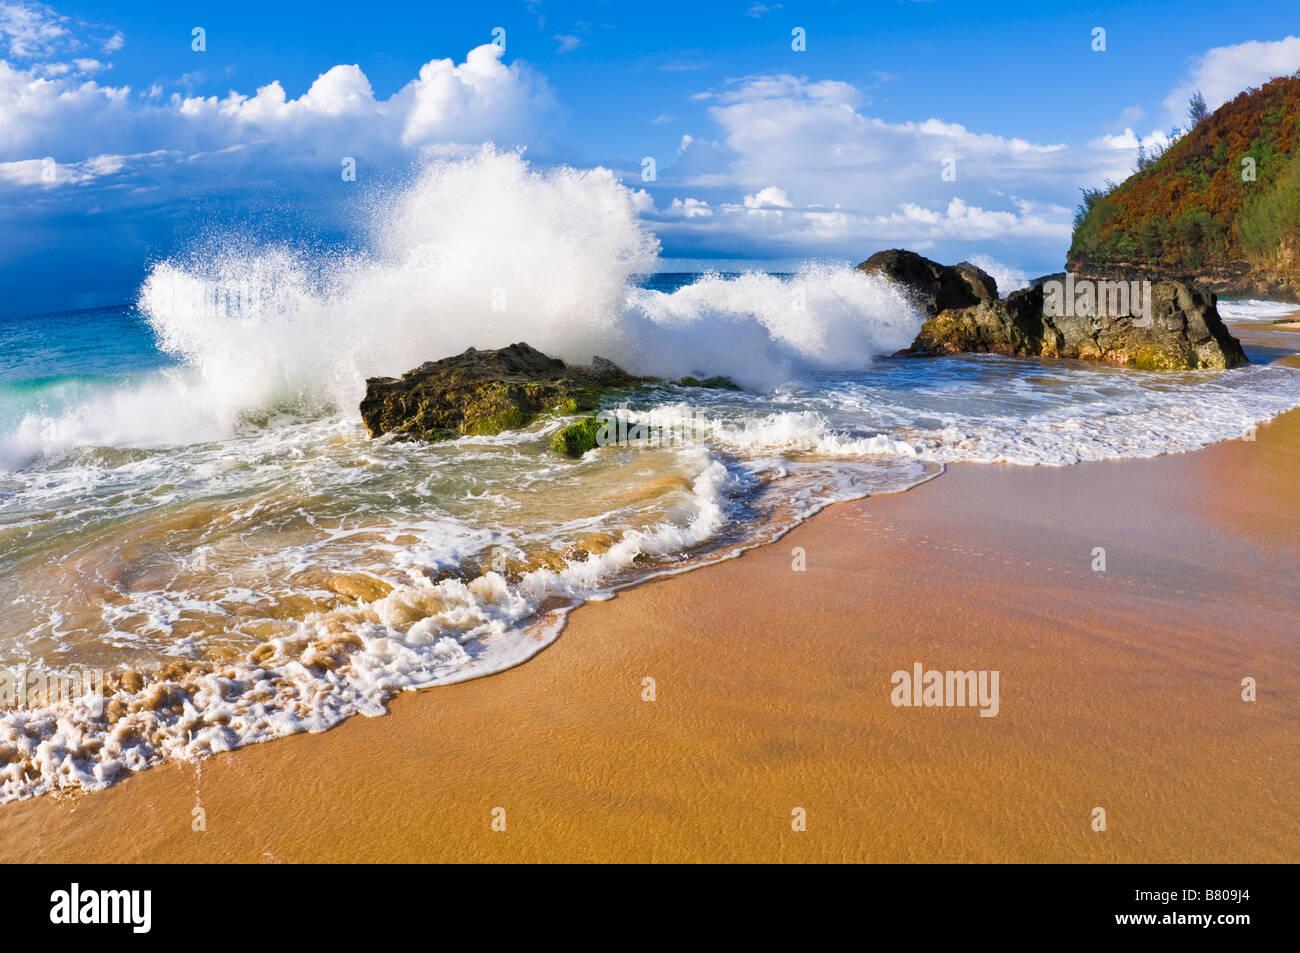 Crashing waves and rocks at Hanakapi ai Beach Na Pali Coast Island of Kauai Hawaii - Stock Image